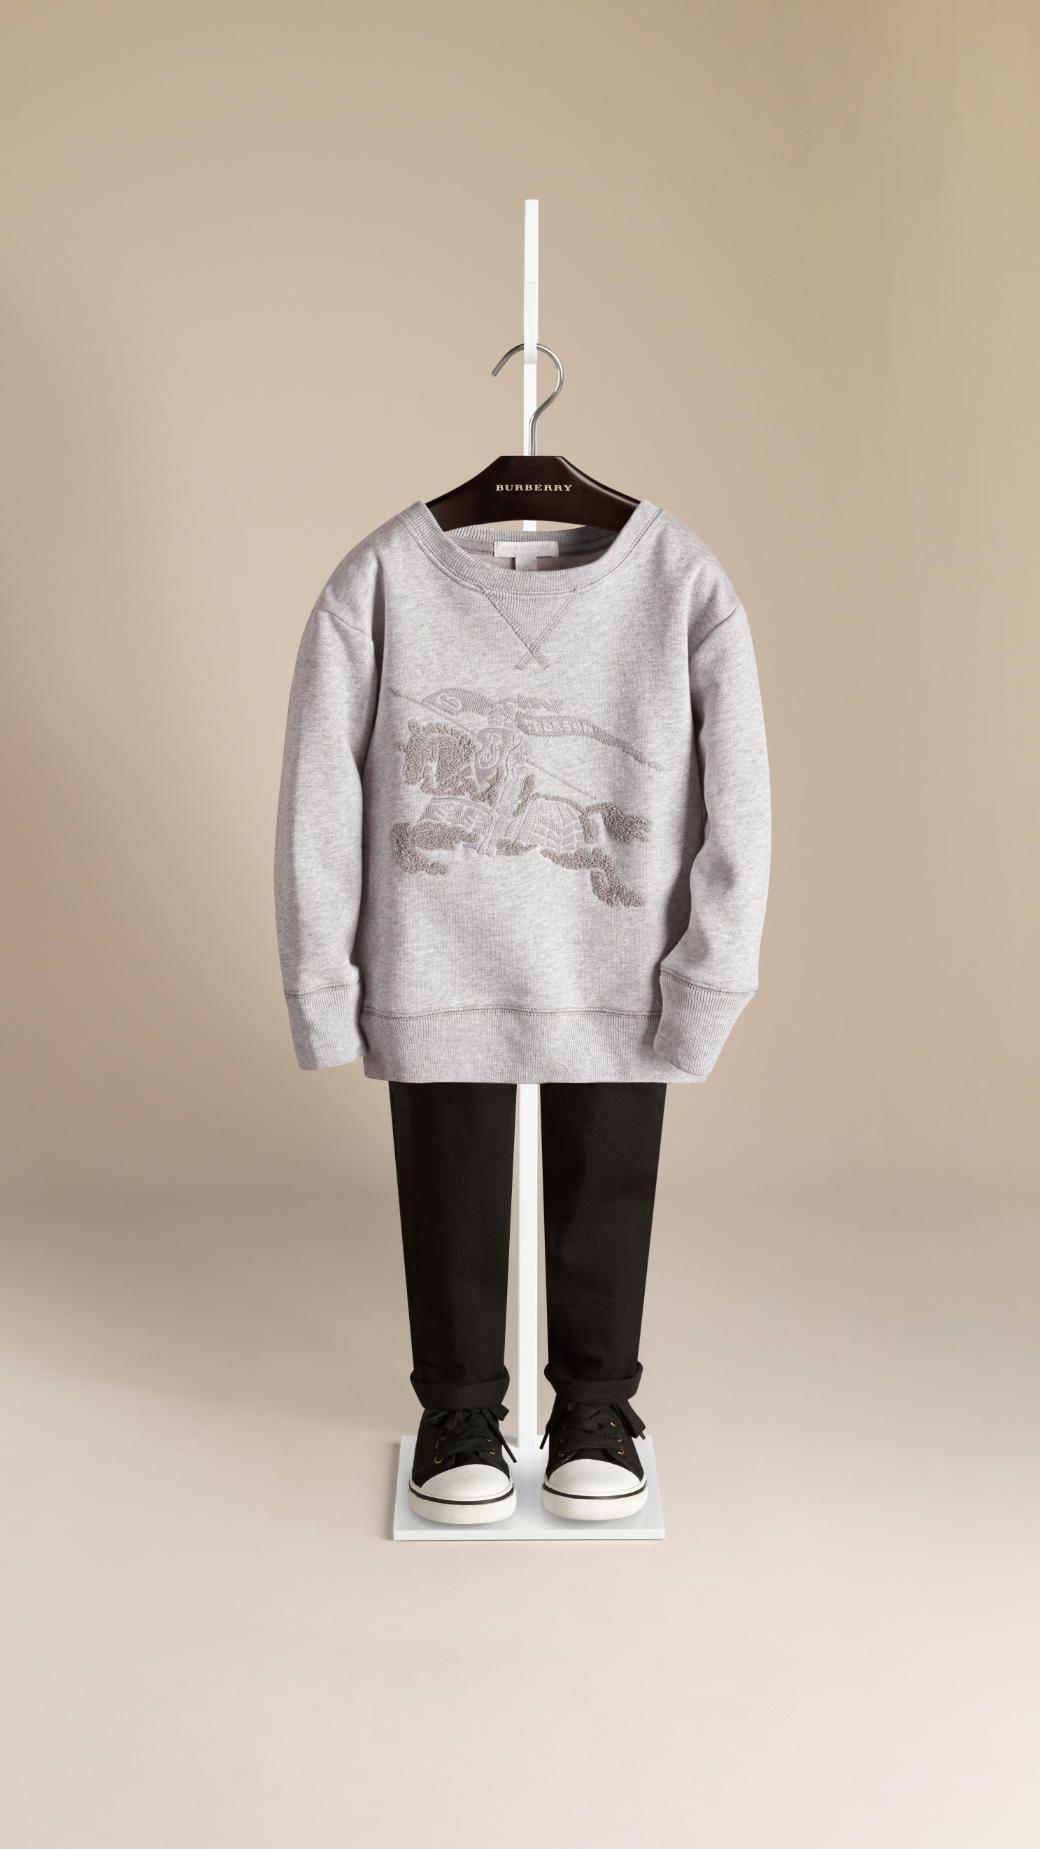 Equestrian Knight Detail Cotton Sweatshirt Burberry